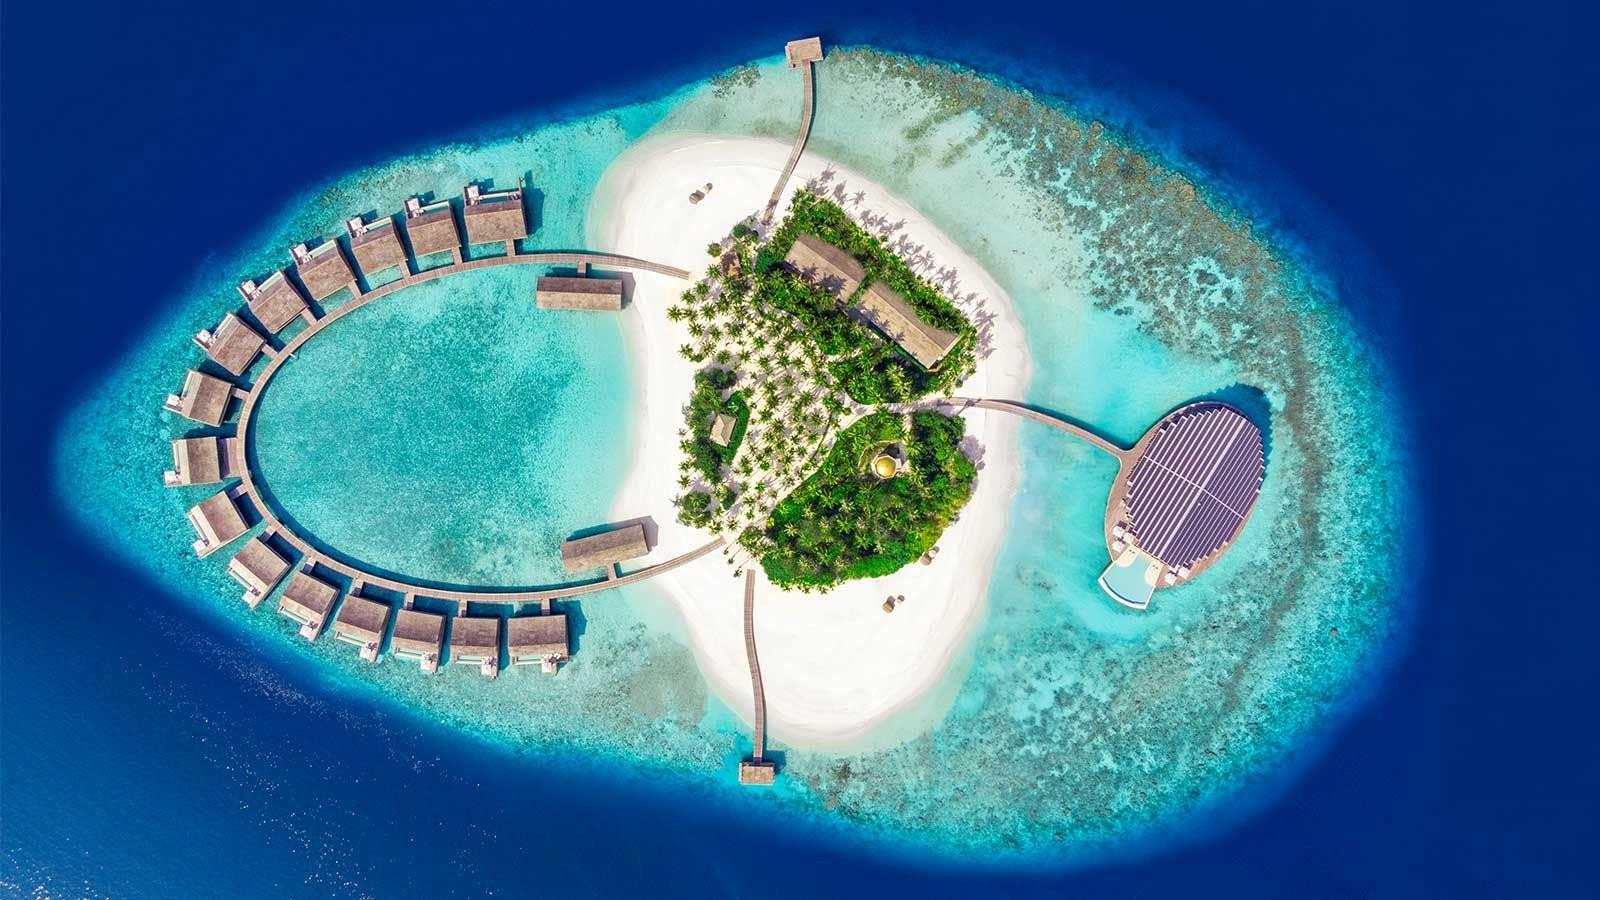 10 Reasons why architects must visit Maldives - Sheet6